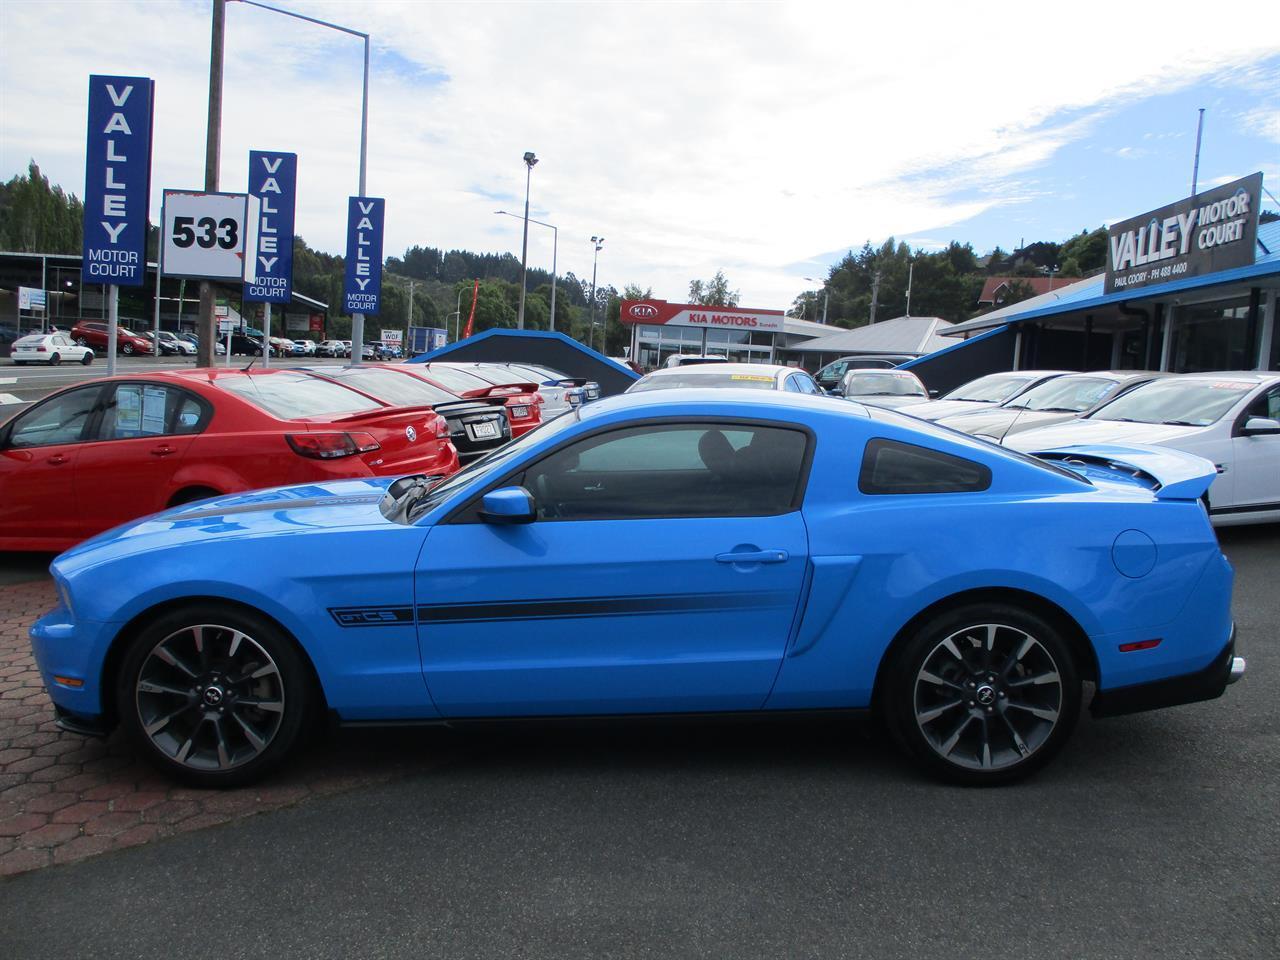 image-7, 2012 Ford Mustang GT/CS at Dunedin